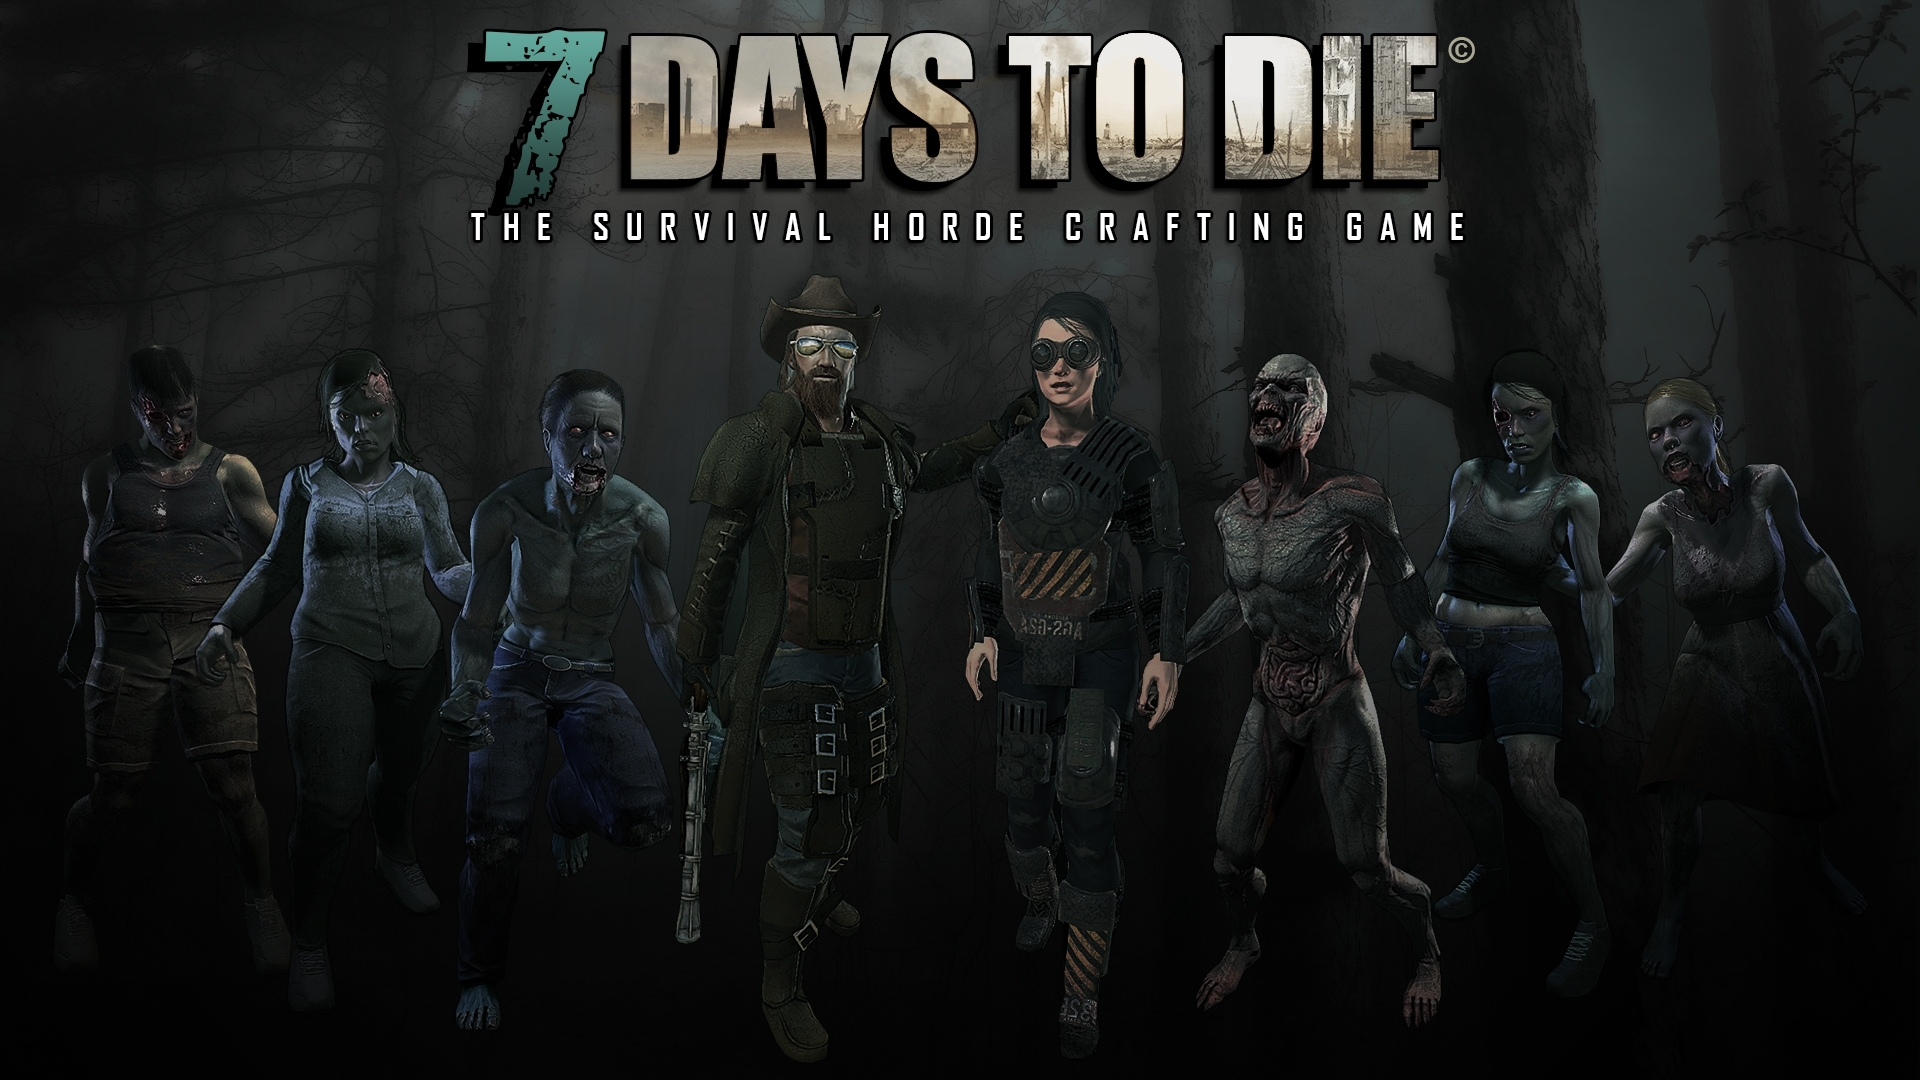 7 days to die wallpapers - wallpapervortex